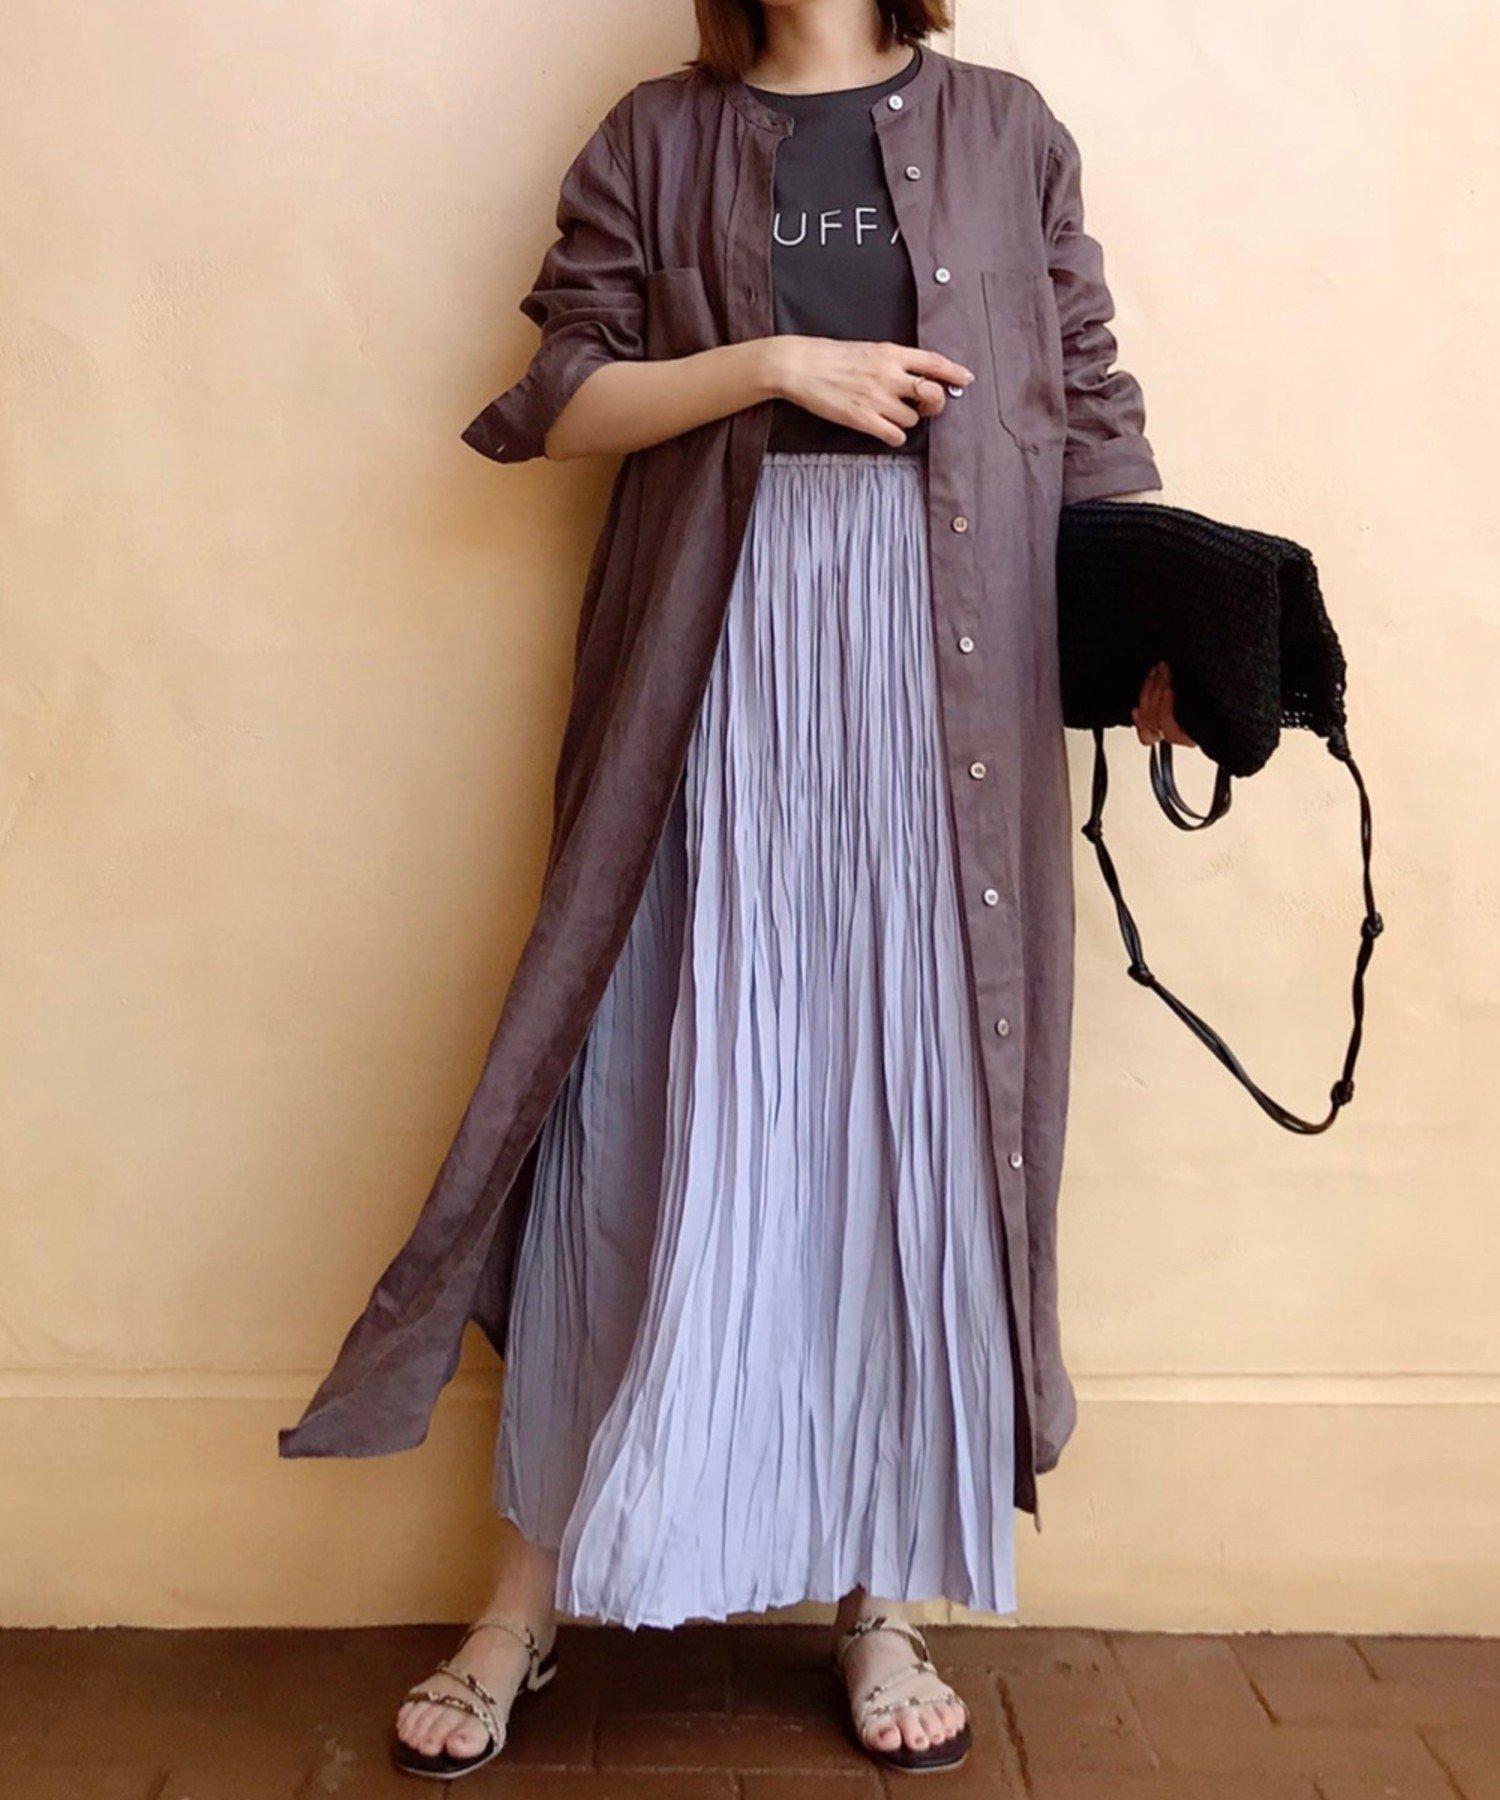 OUTLET premium(アウトレット プレミアム) 【手洗い可】ヴィンテージデシンプリーツスカート